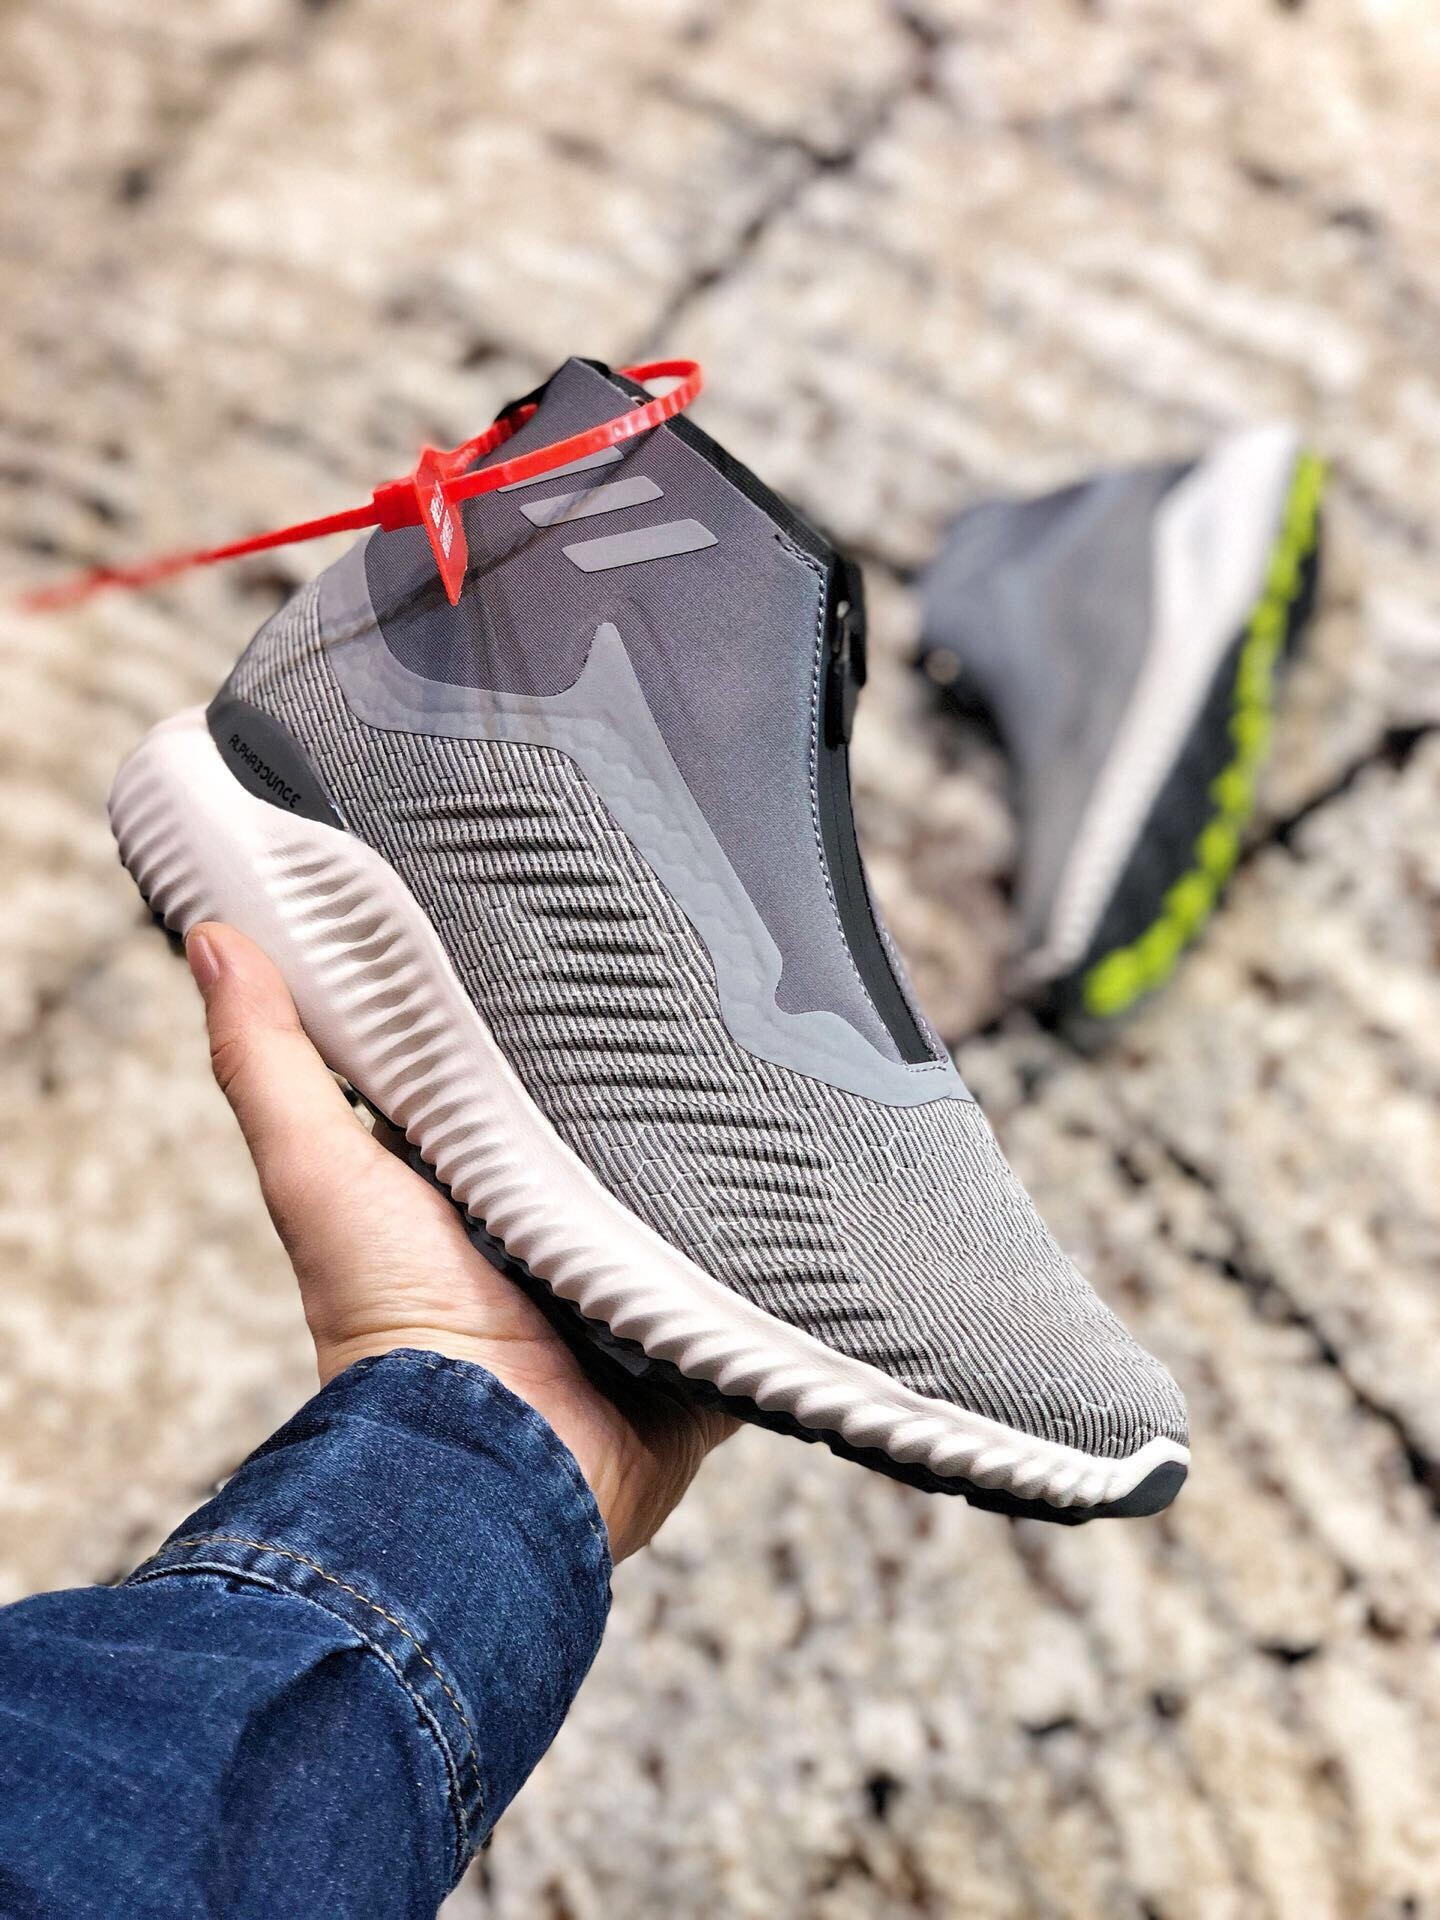 Adidas Alpha Bounce Zip Light Grey Shoes